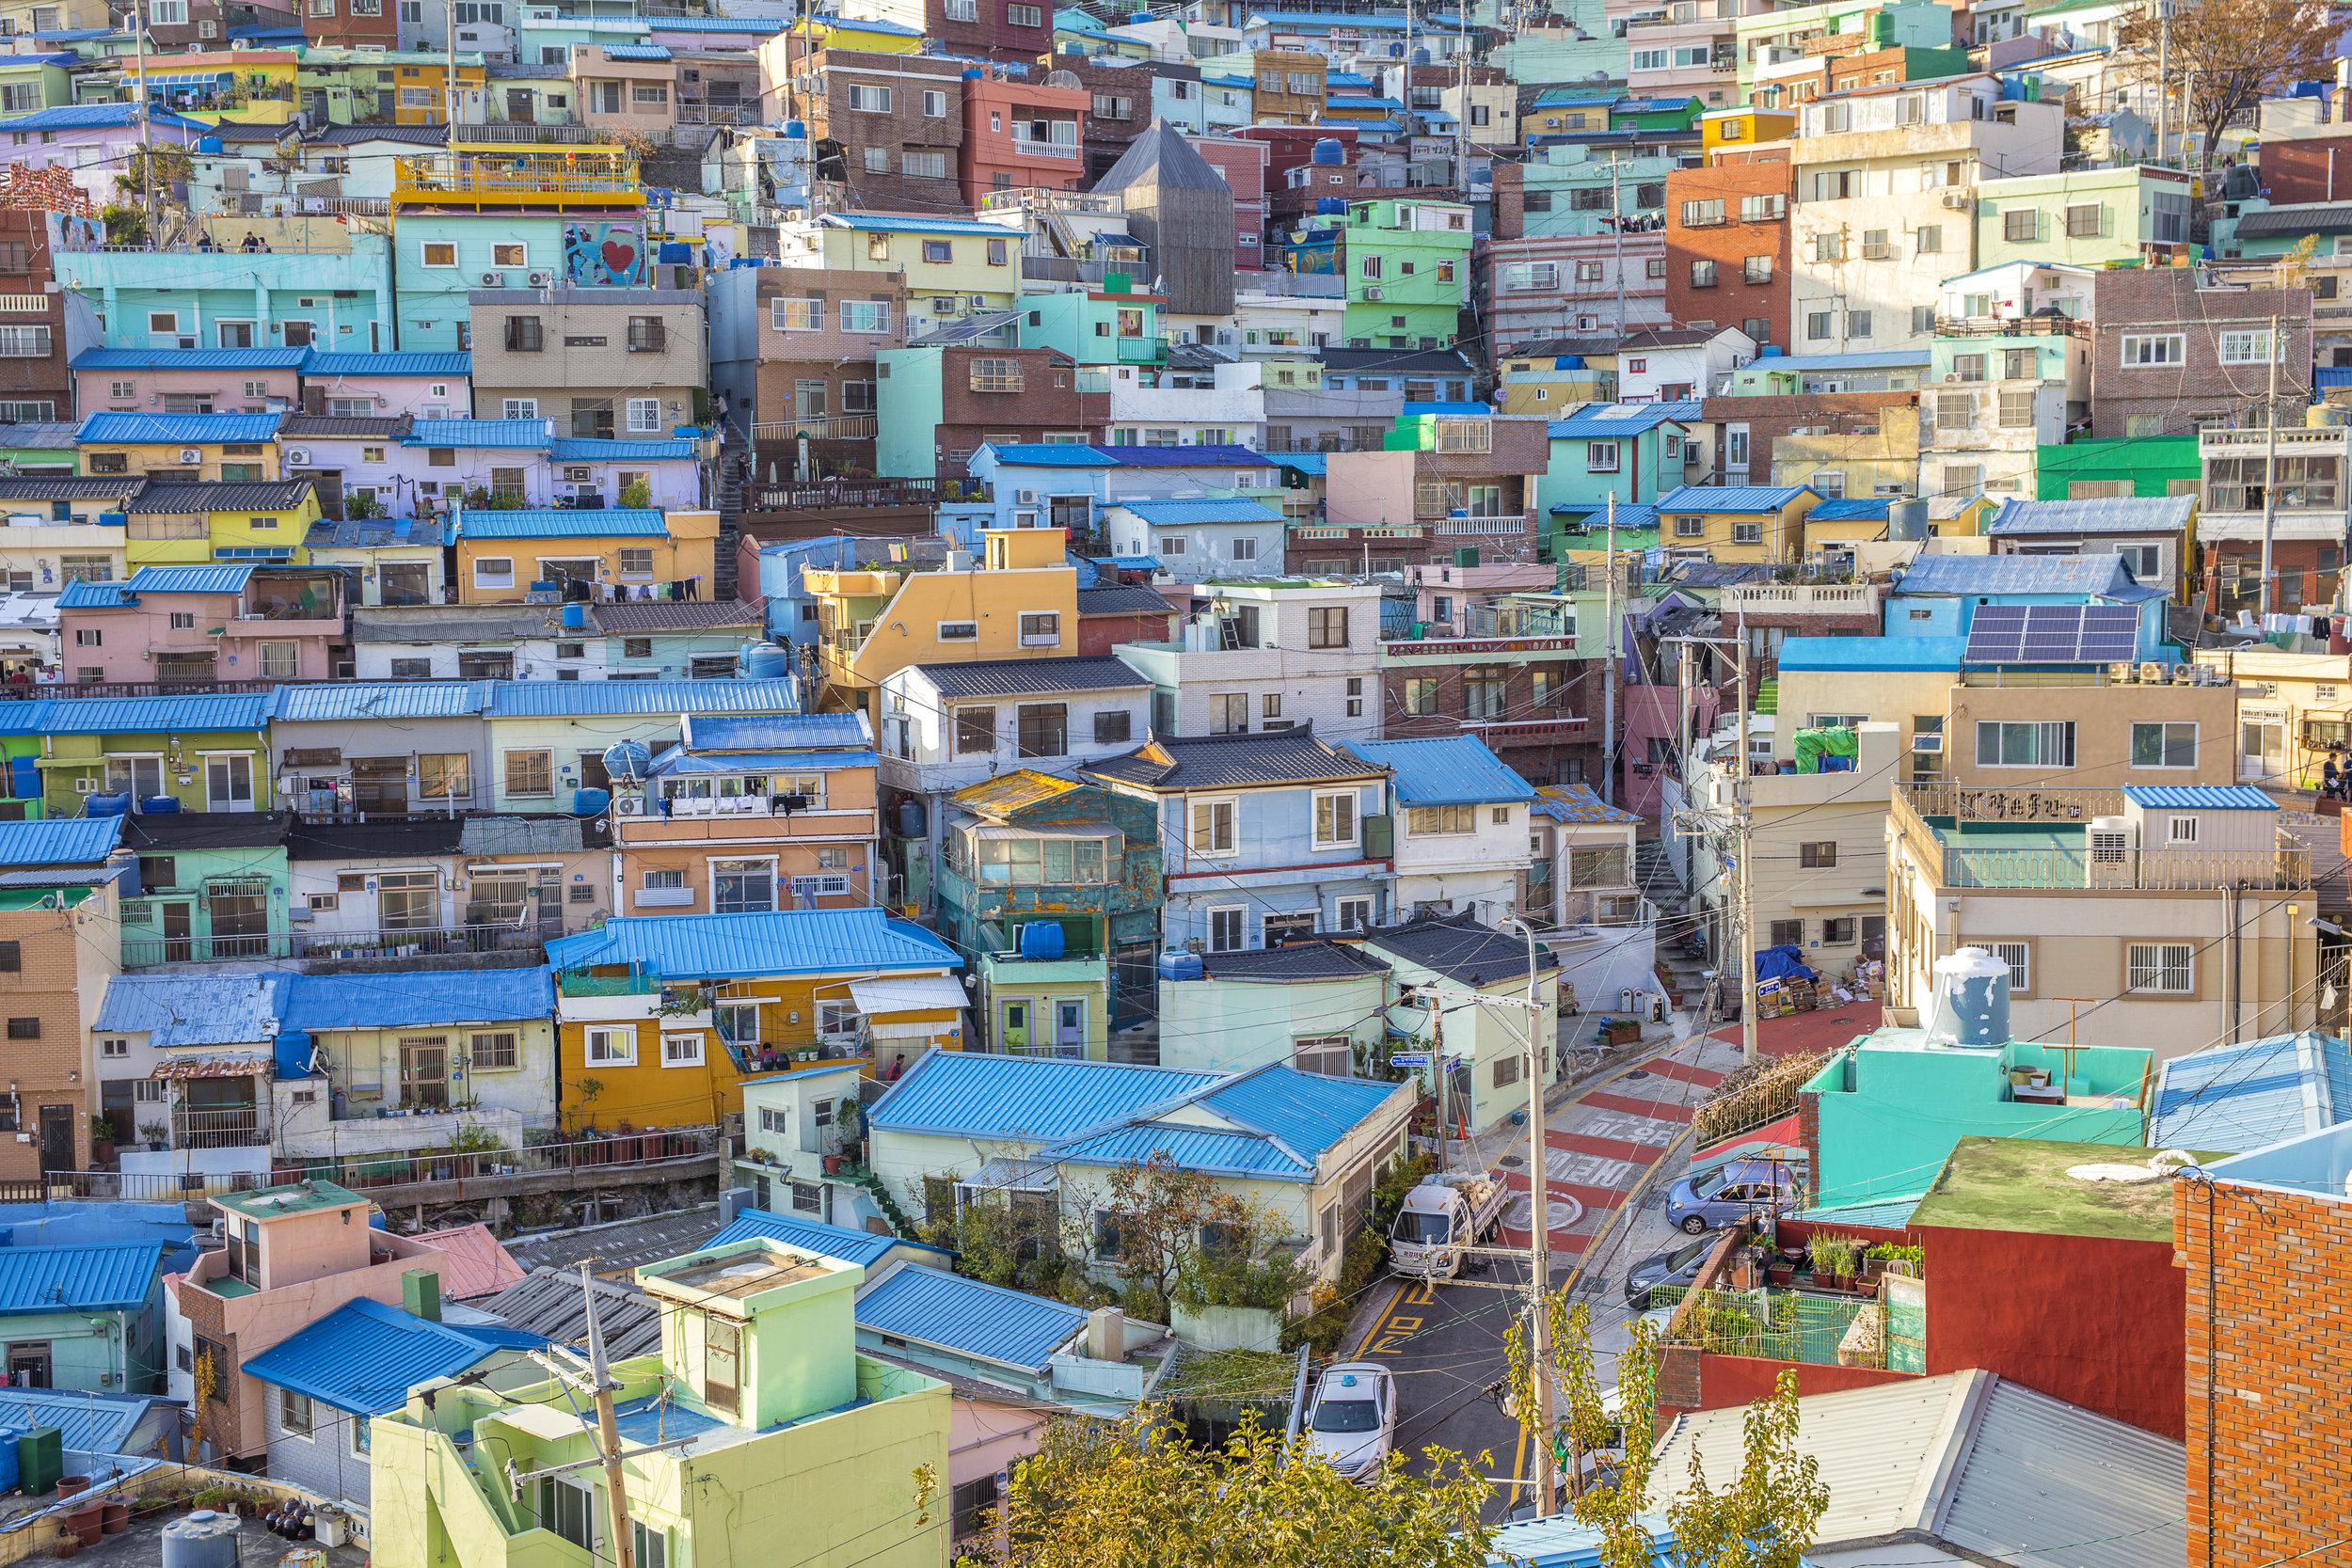 Busan, South Korea